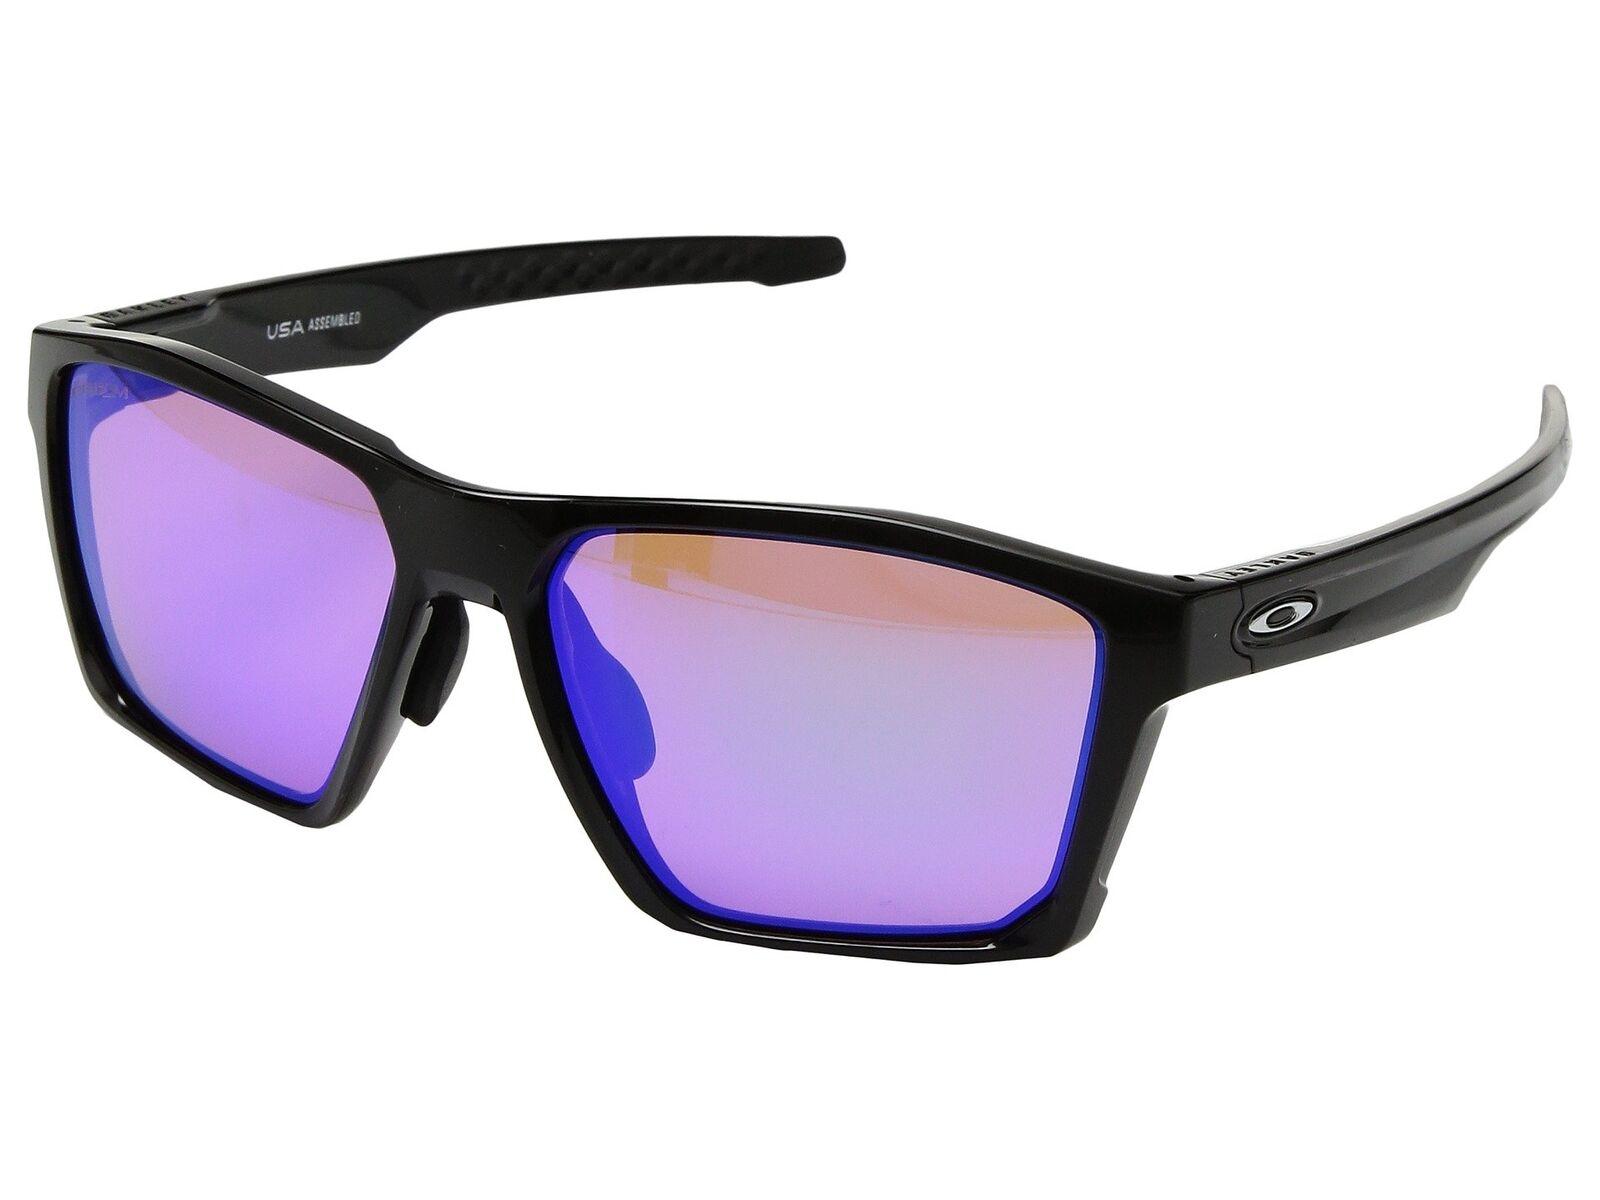 a6821c23c1b Oakley Targetline Asian Fit Sunglasses OO9398-0458 Black Prizm Golf 9398 04